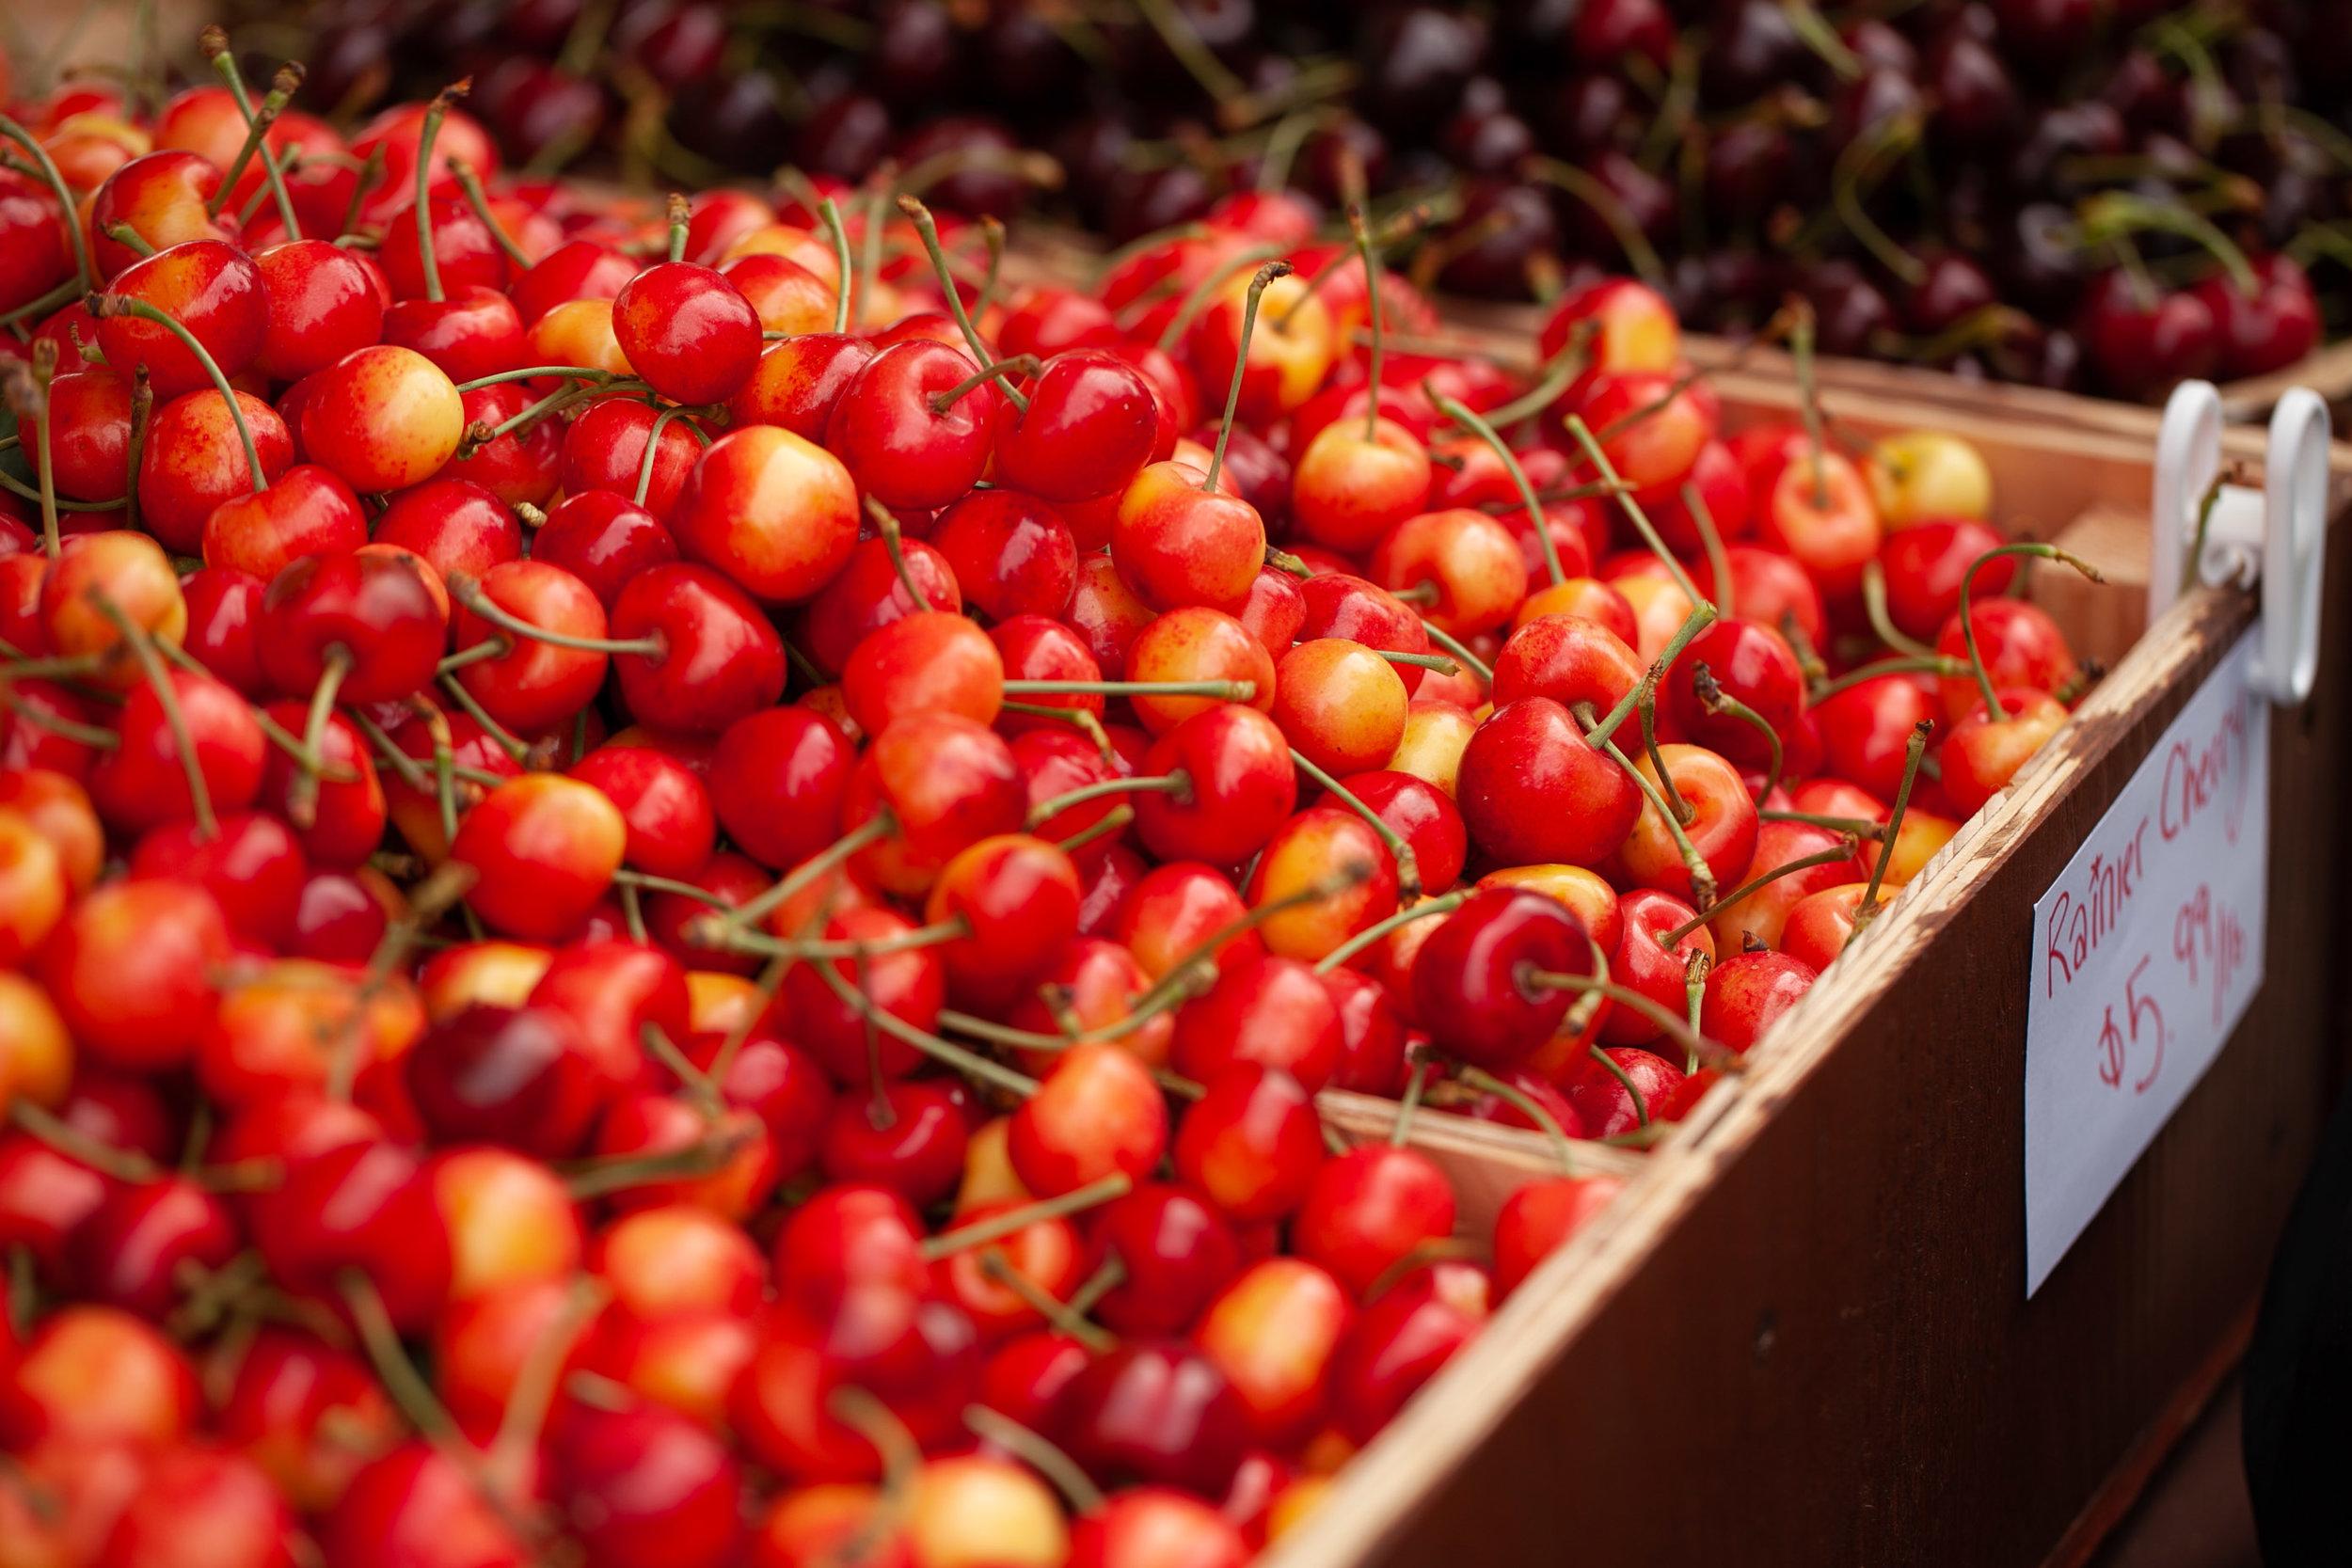 Cherries of Wrath - Reno News & Review